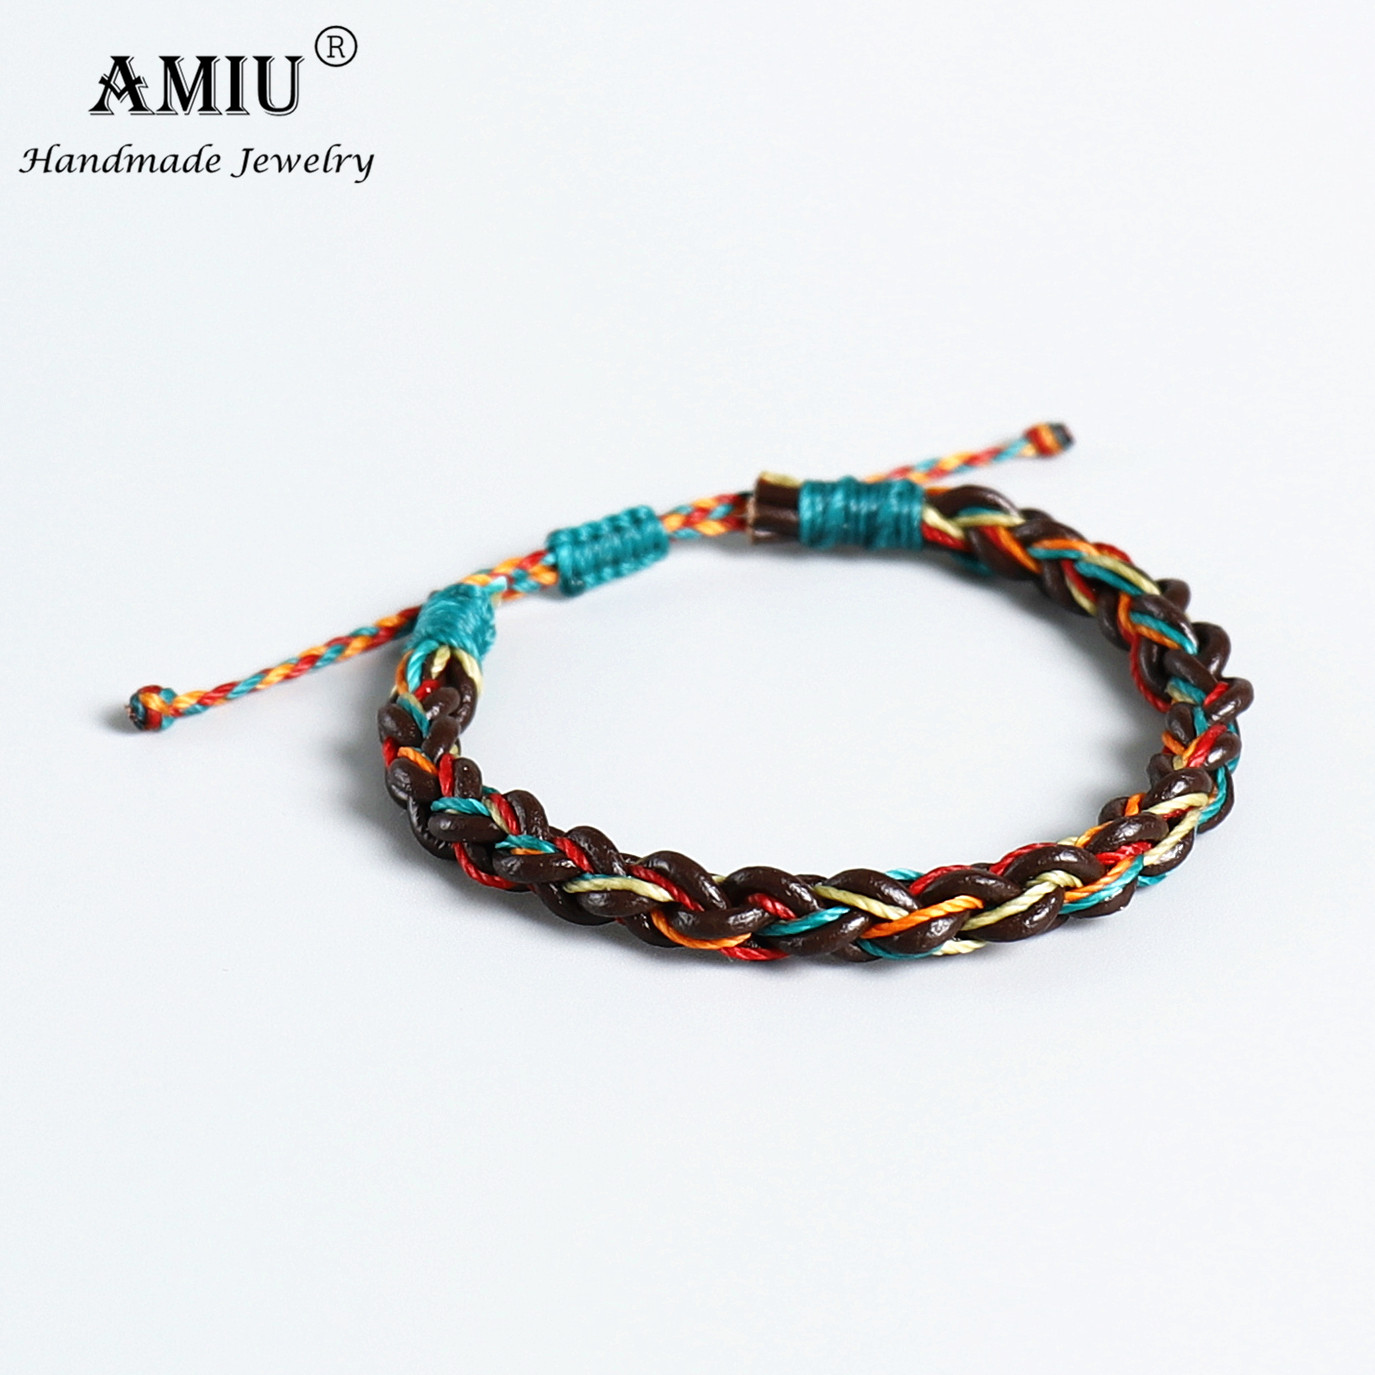 AMIU Handmade Real Leather Waterproof Wax Thread Lucky Rope Bracelet & Bangles For Women Men Friendship Woven Macrame Bracelets